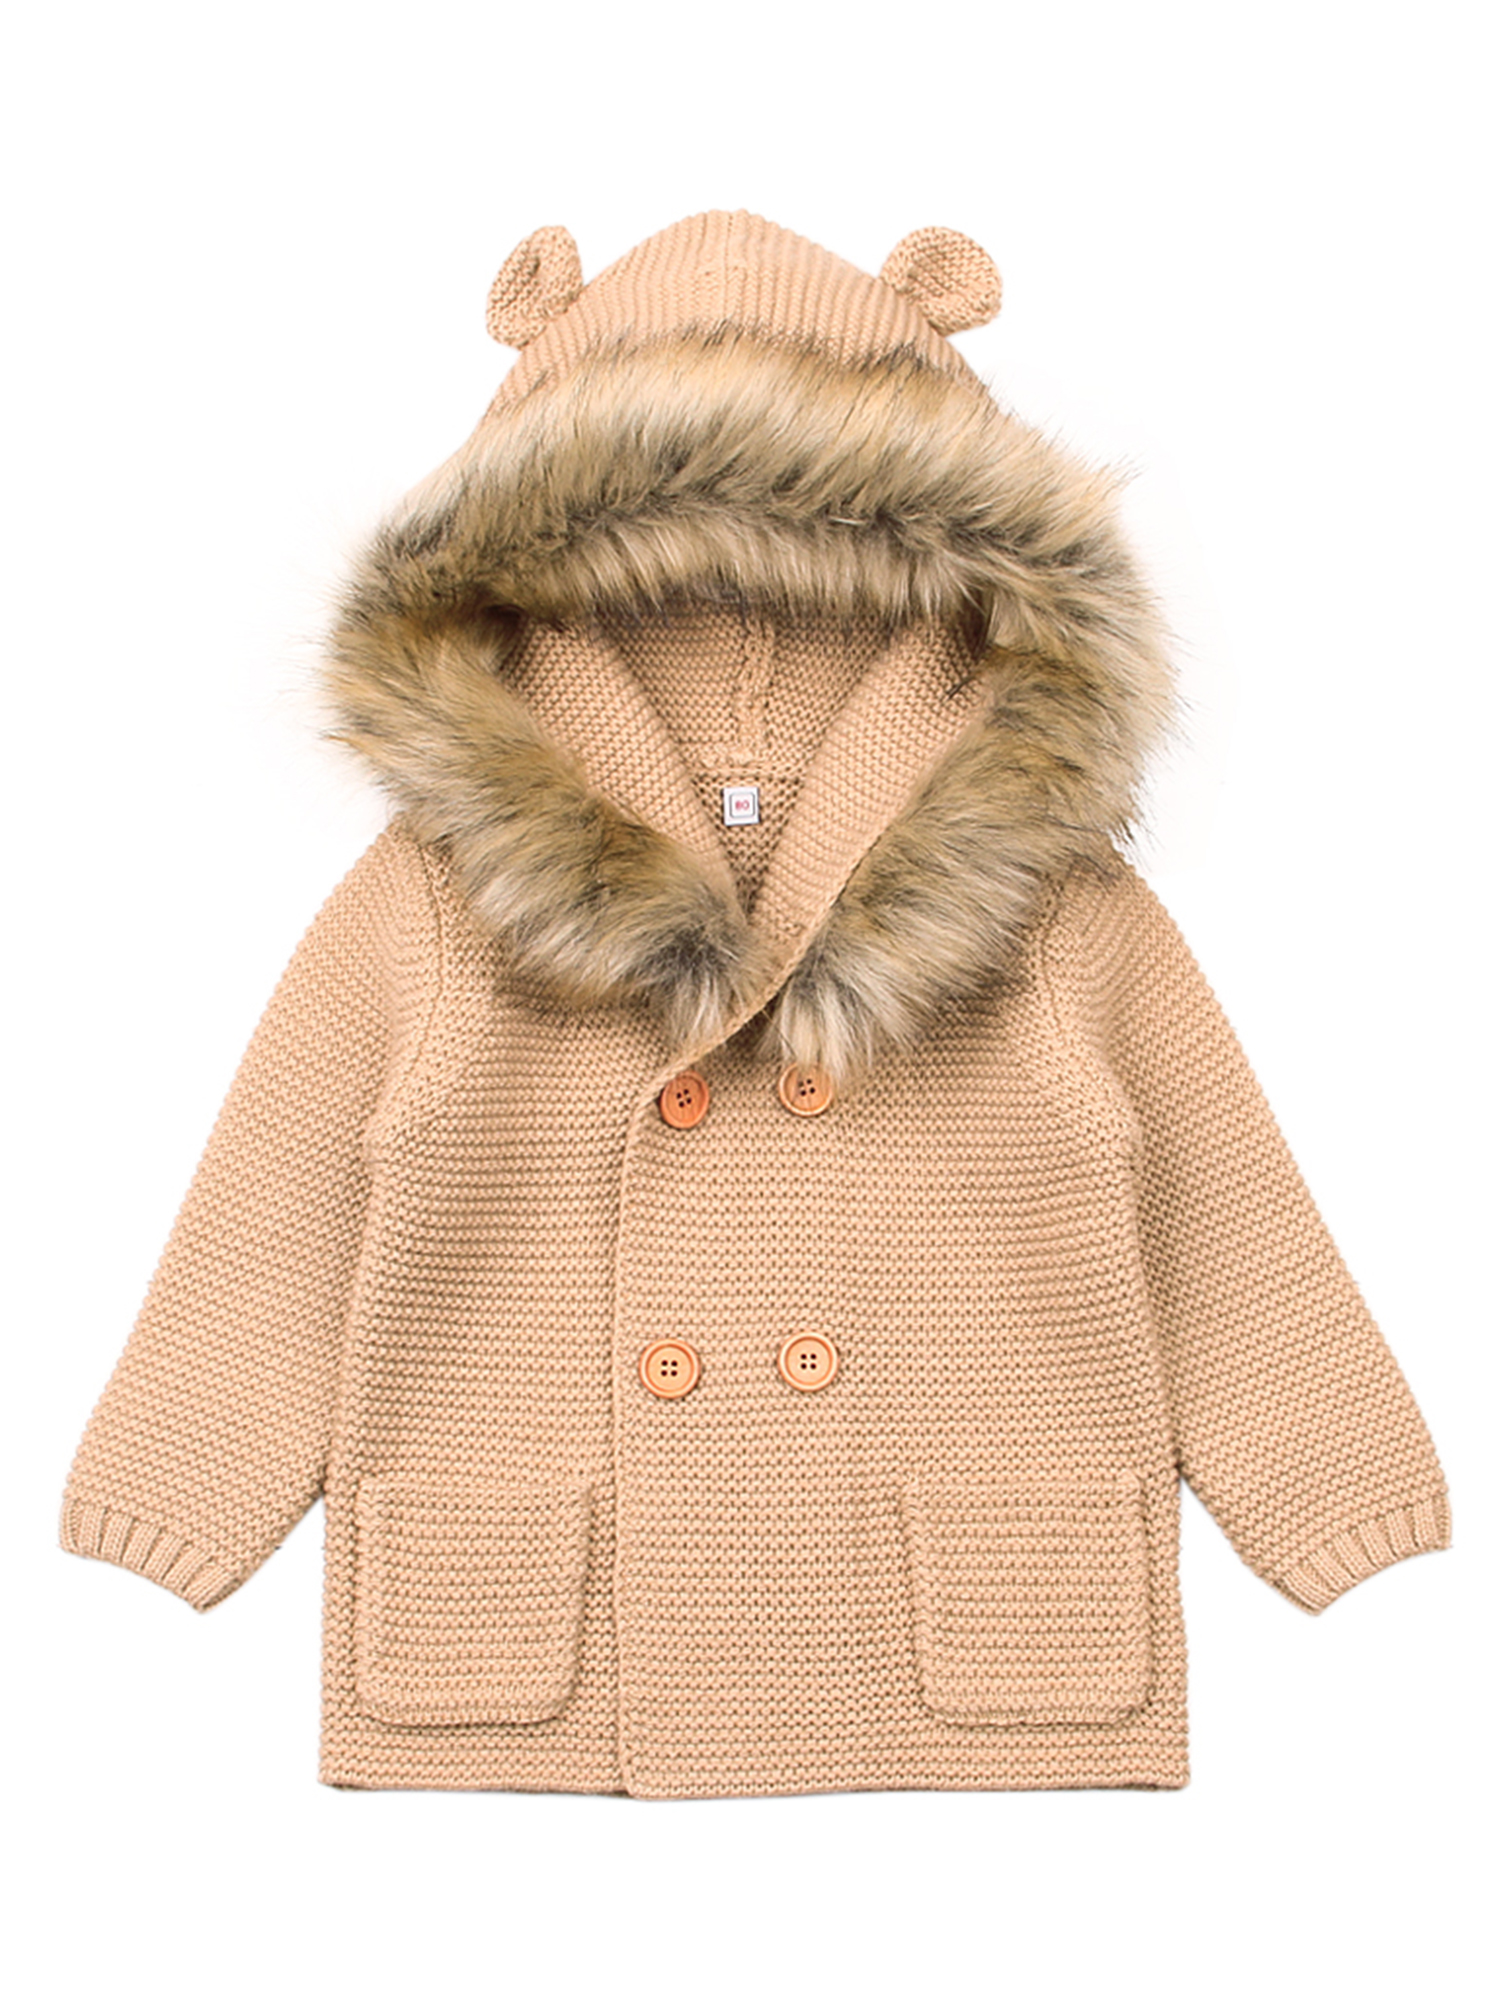 Baby Cardigan Sweater Jacket Cartoon Hoodies Long Sleeve